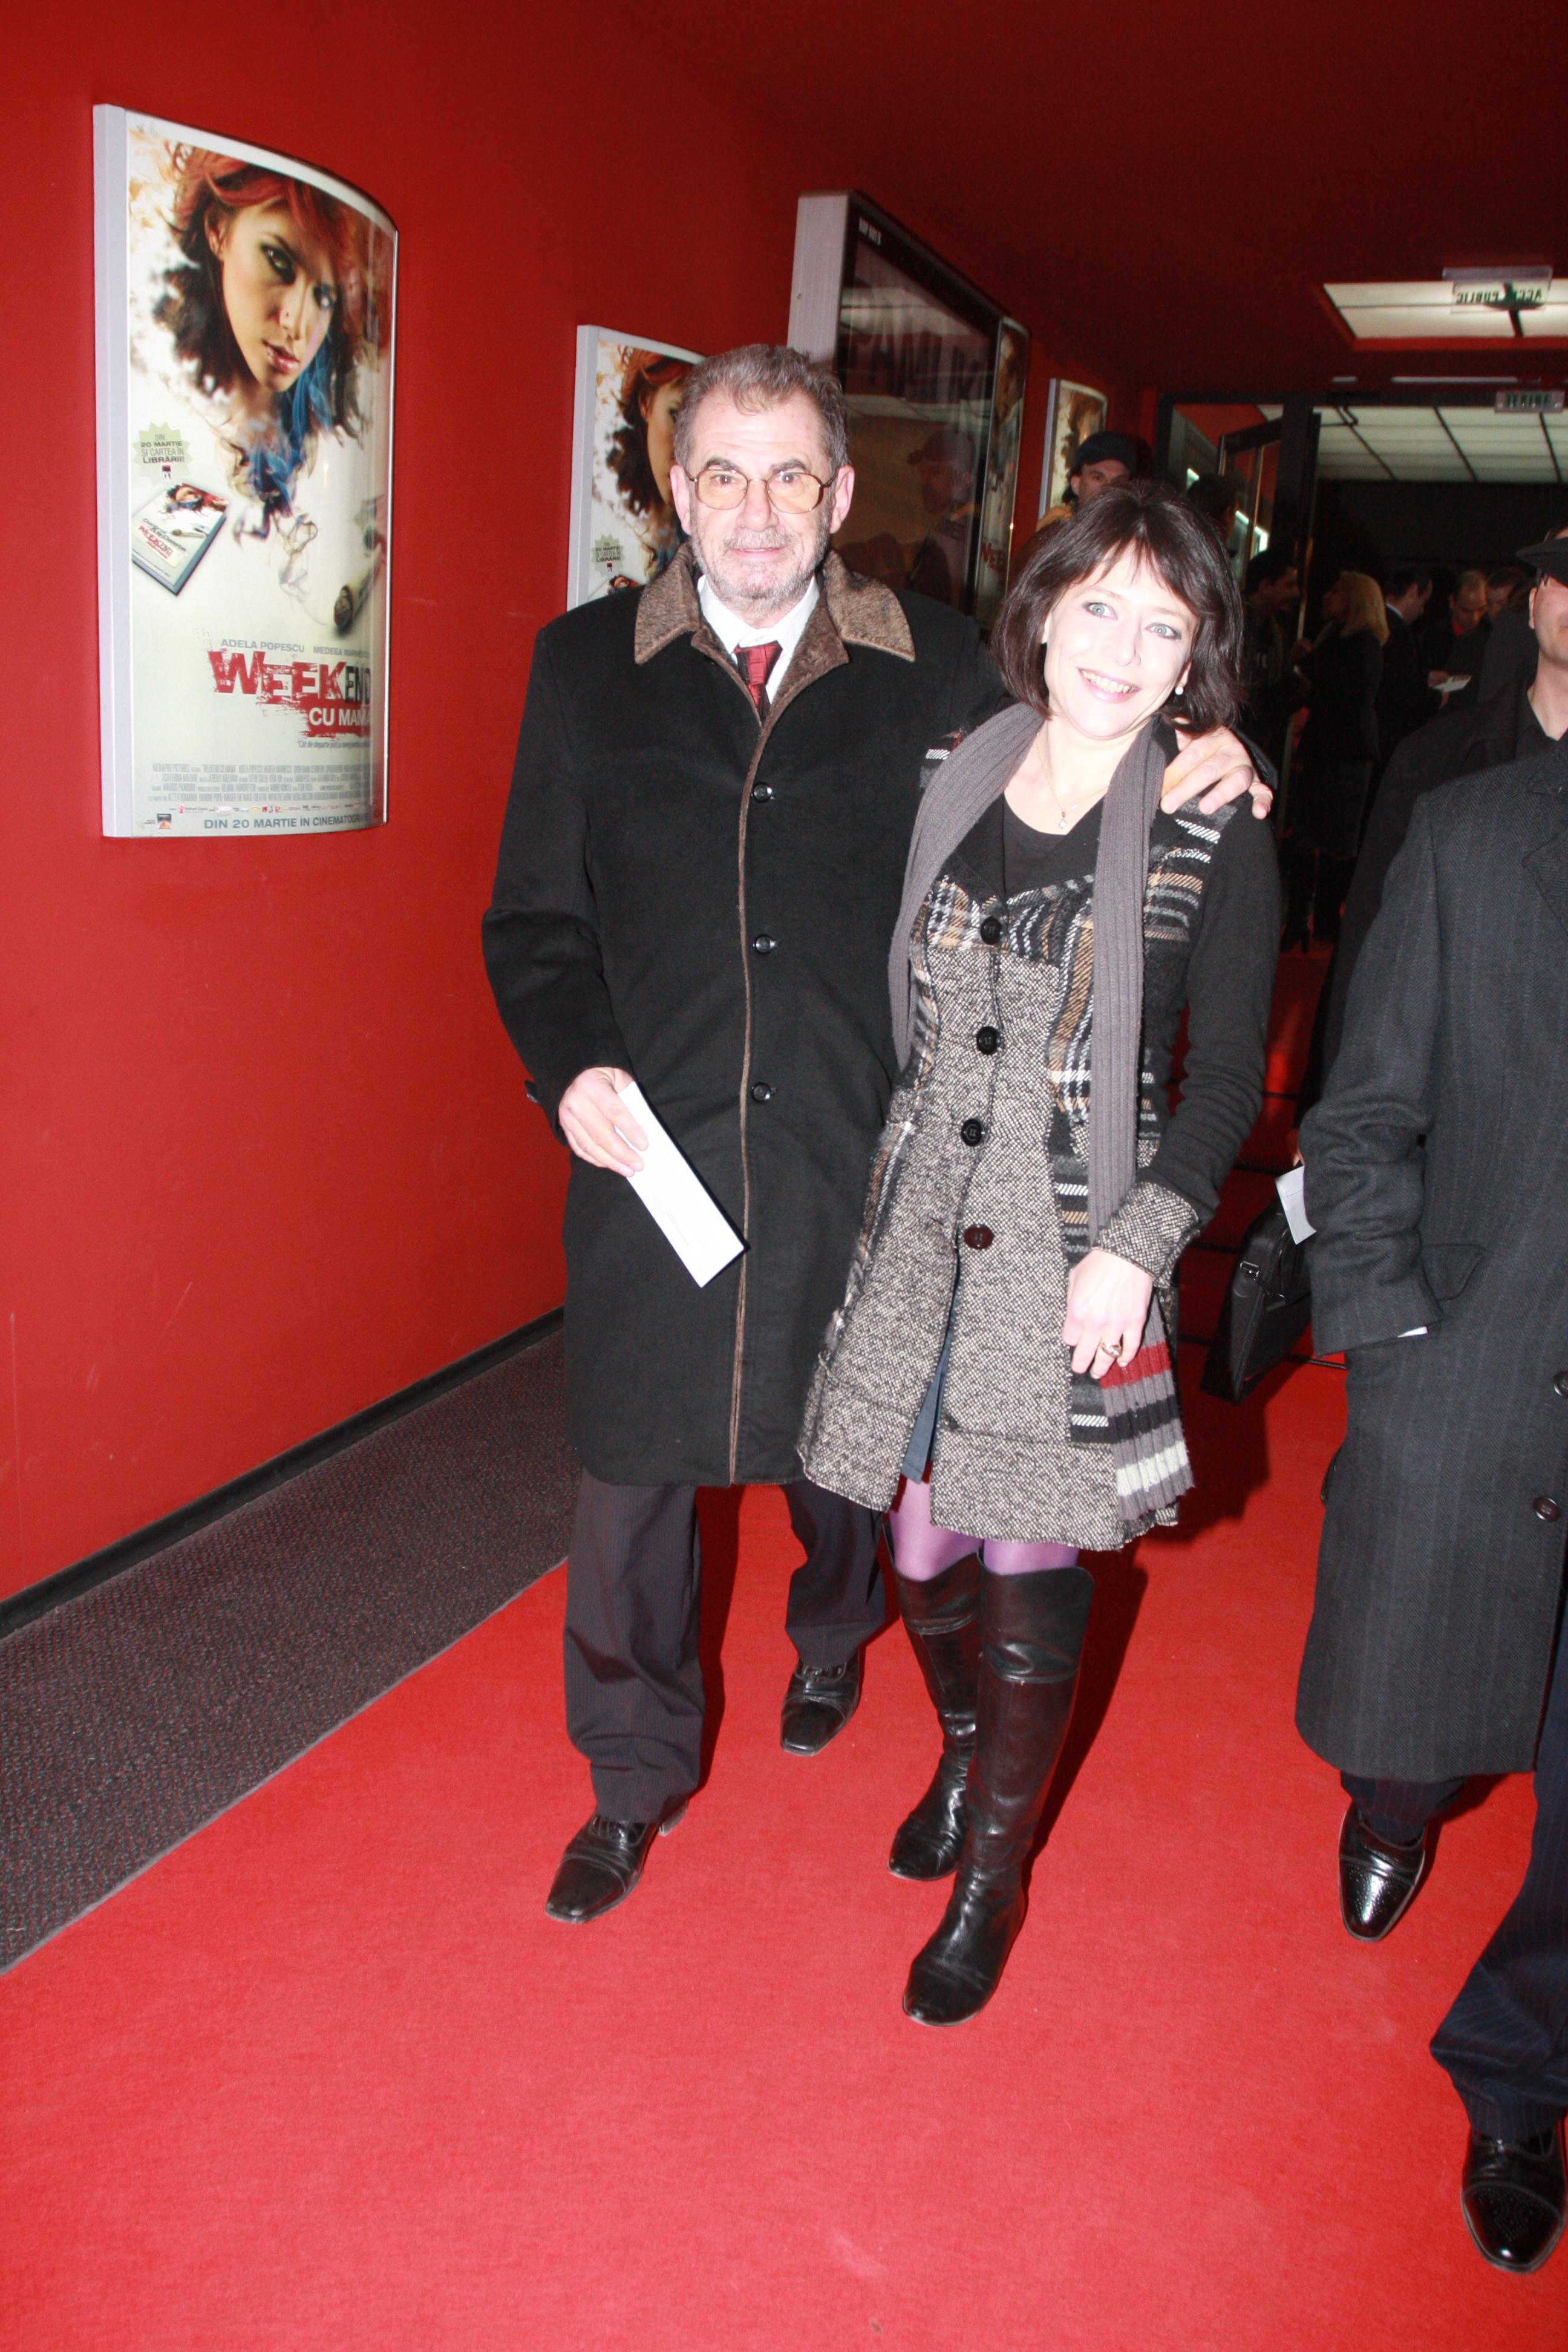 Catalina Mustata si Florin Zamfirescu au divortat anul trecut, dupa 21 de ani de mariaj